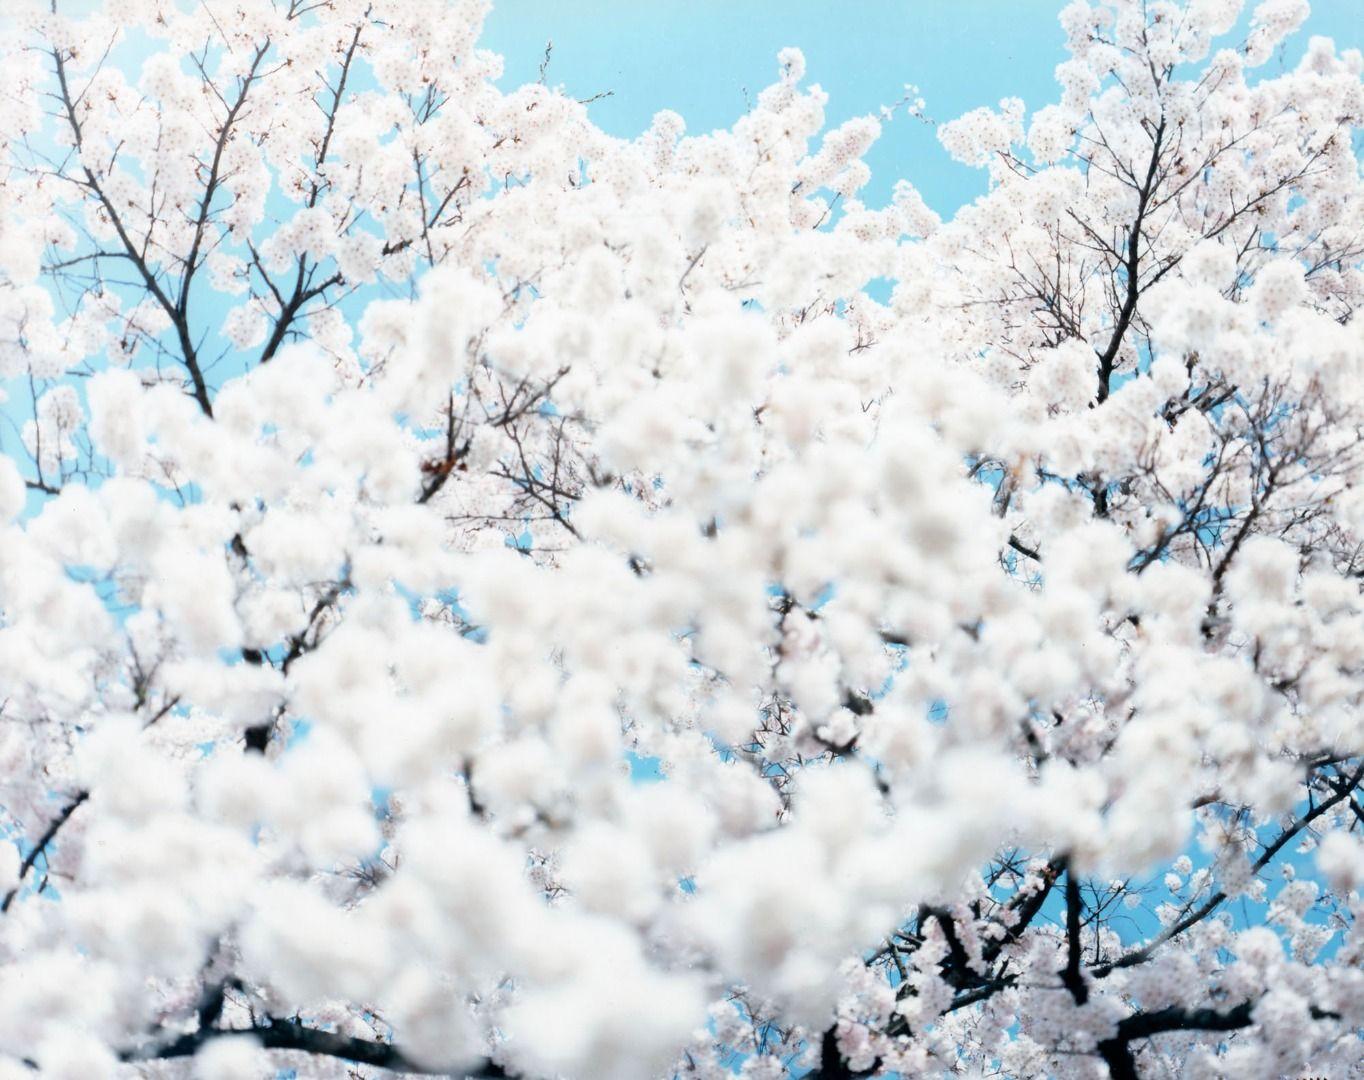 Sakura: Time with Cherry Blossoms